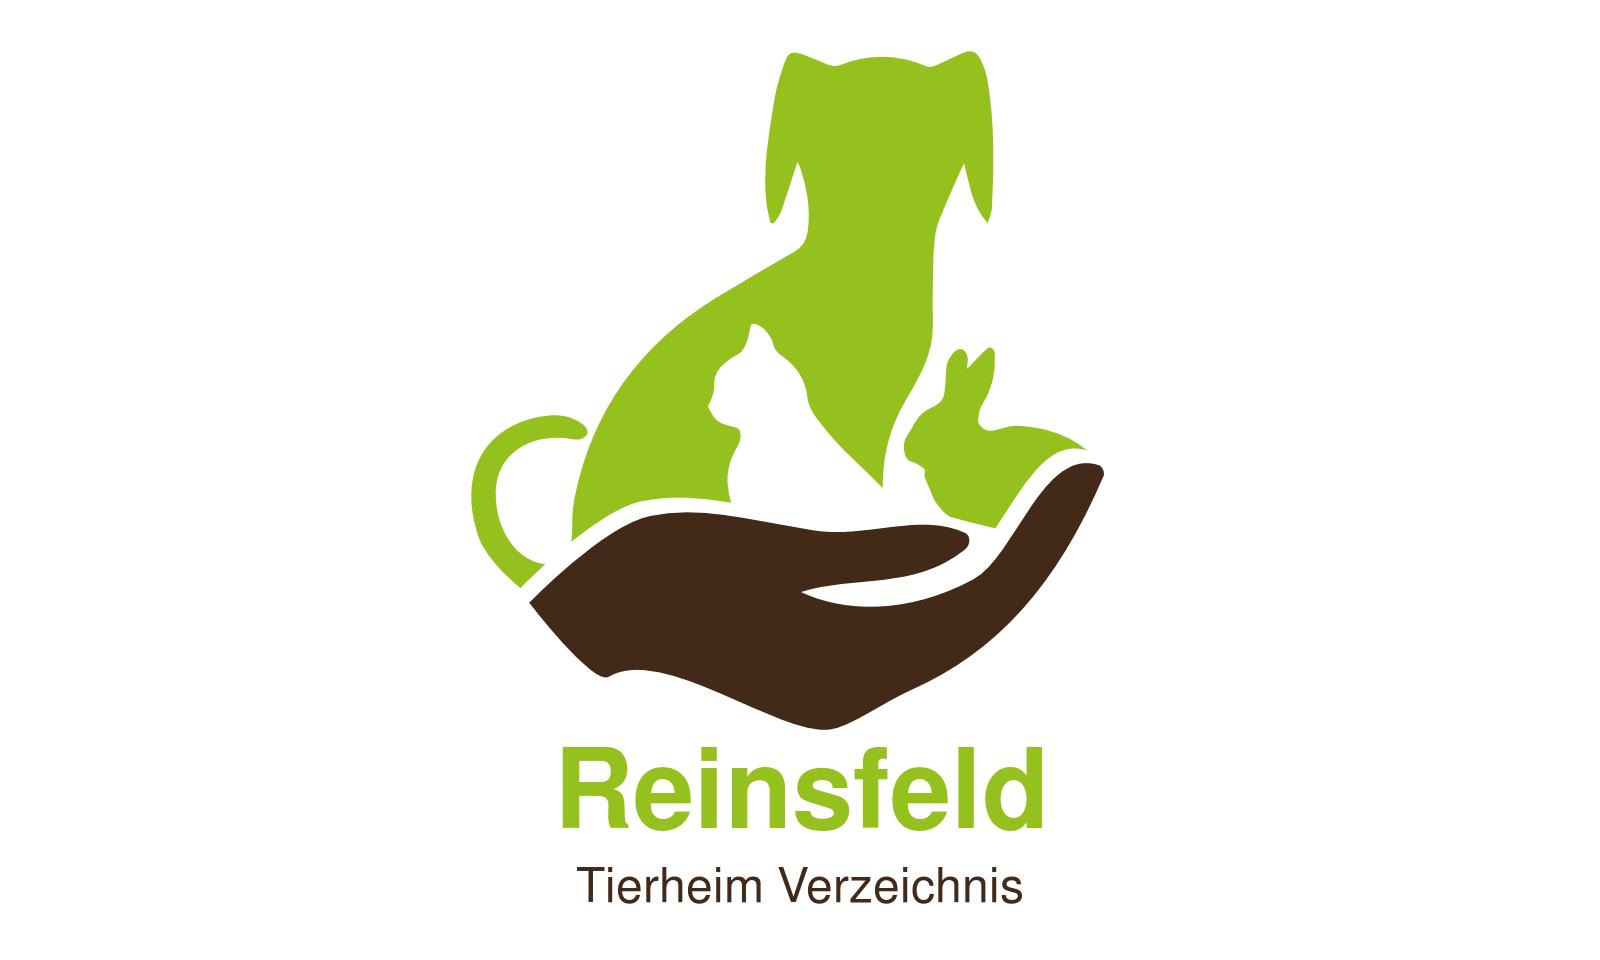 Tierheim Reinsfeld